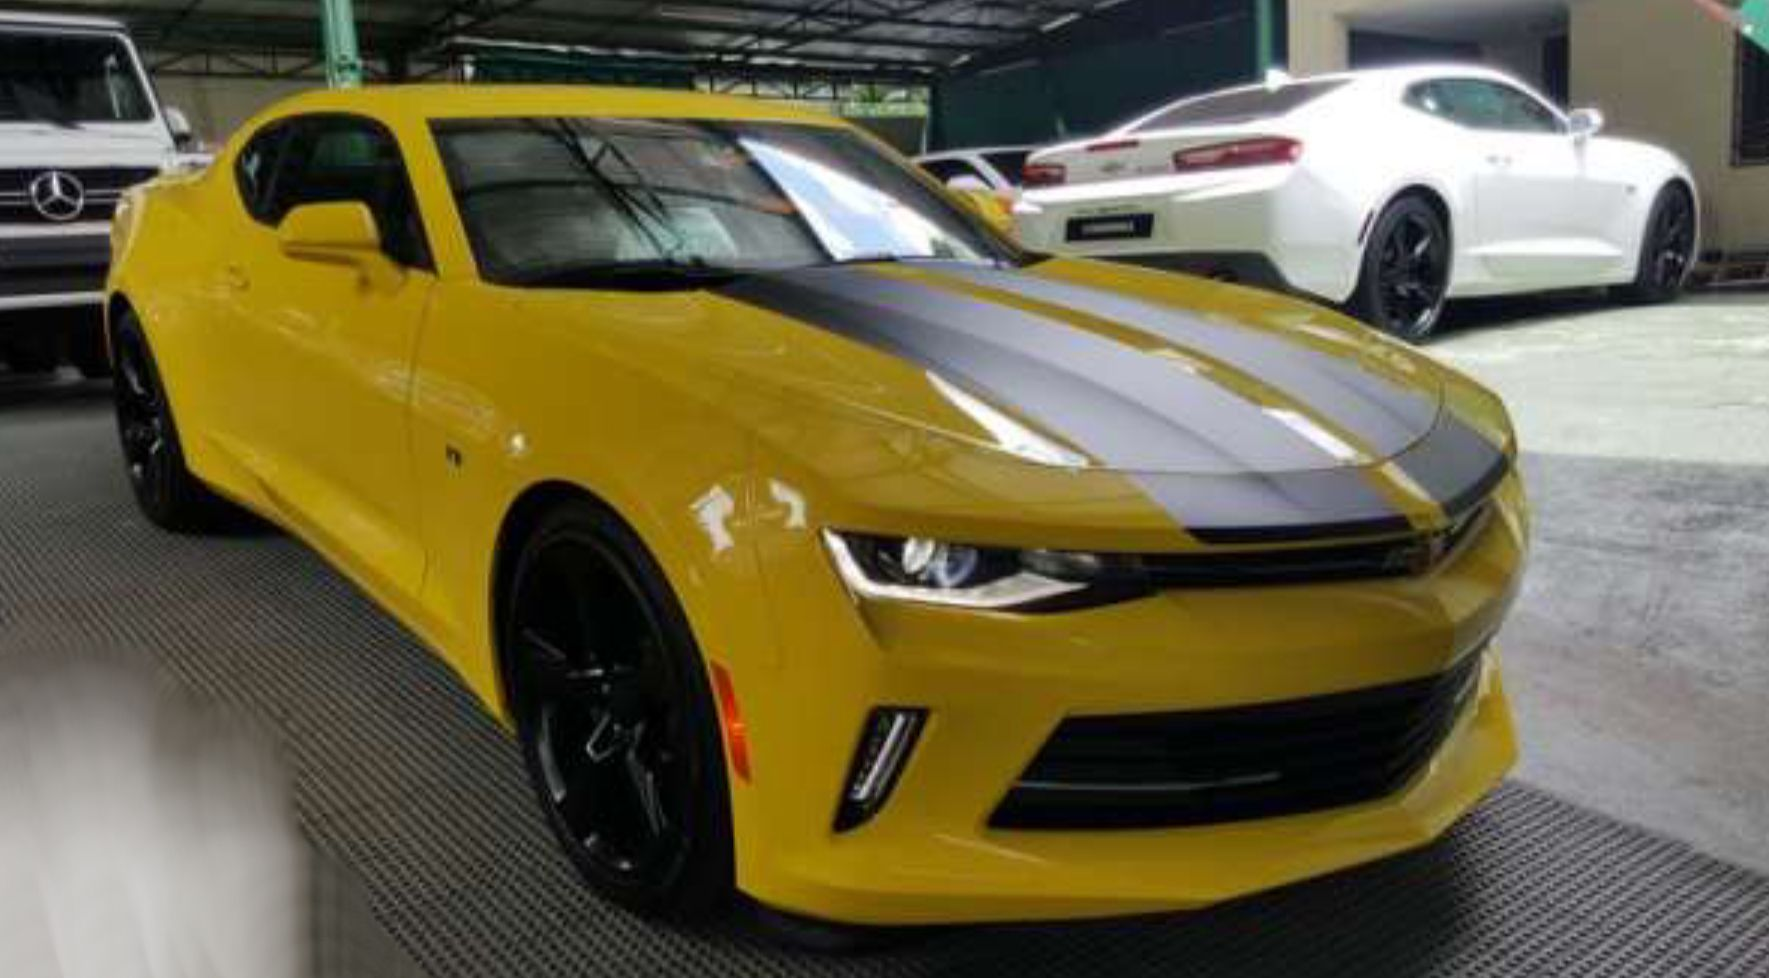 2016 Chevrolet Camaro RS 3.6Li V6 Chevrolet camaro, Cars